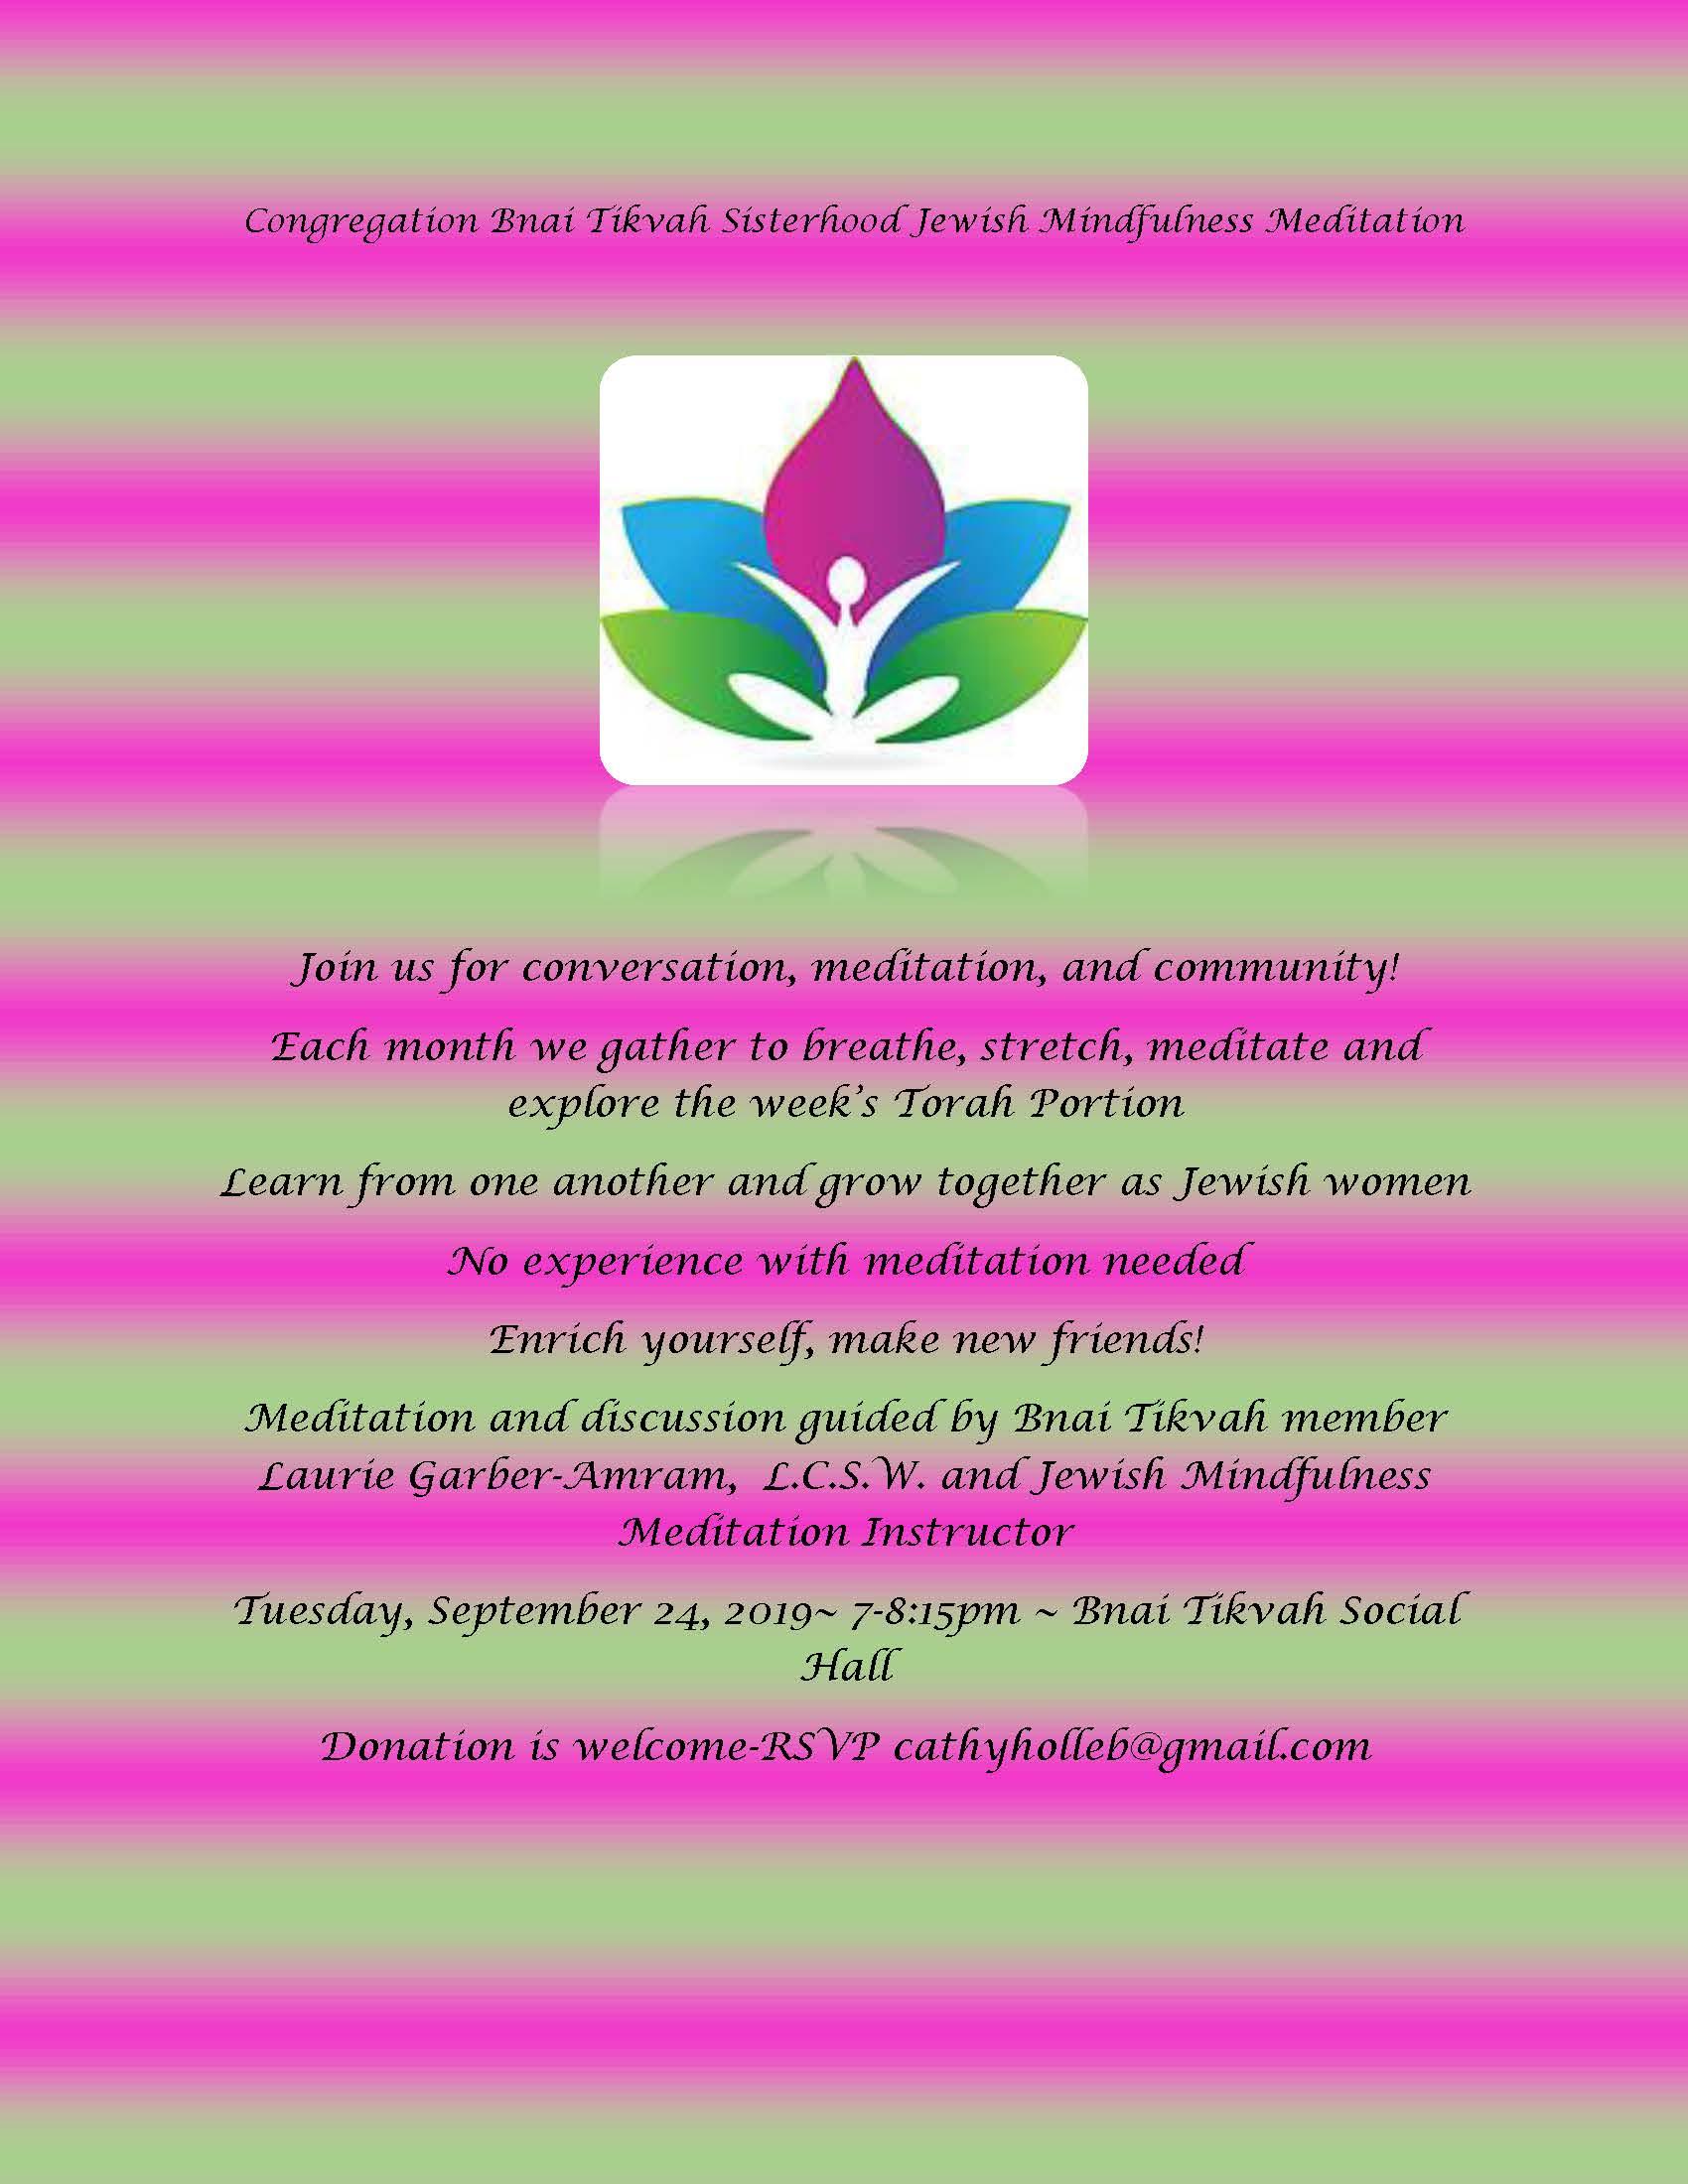 Sisterhood Jewish Mindfulness Meditation